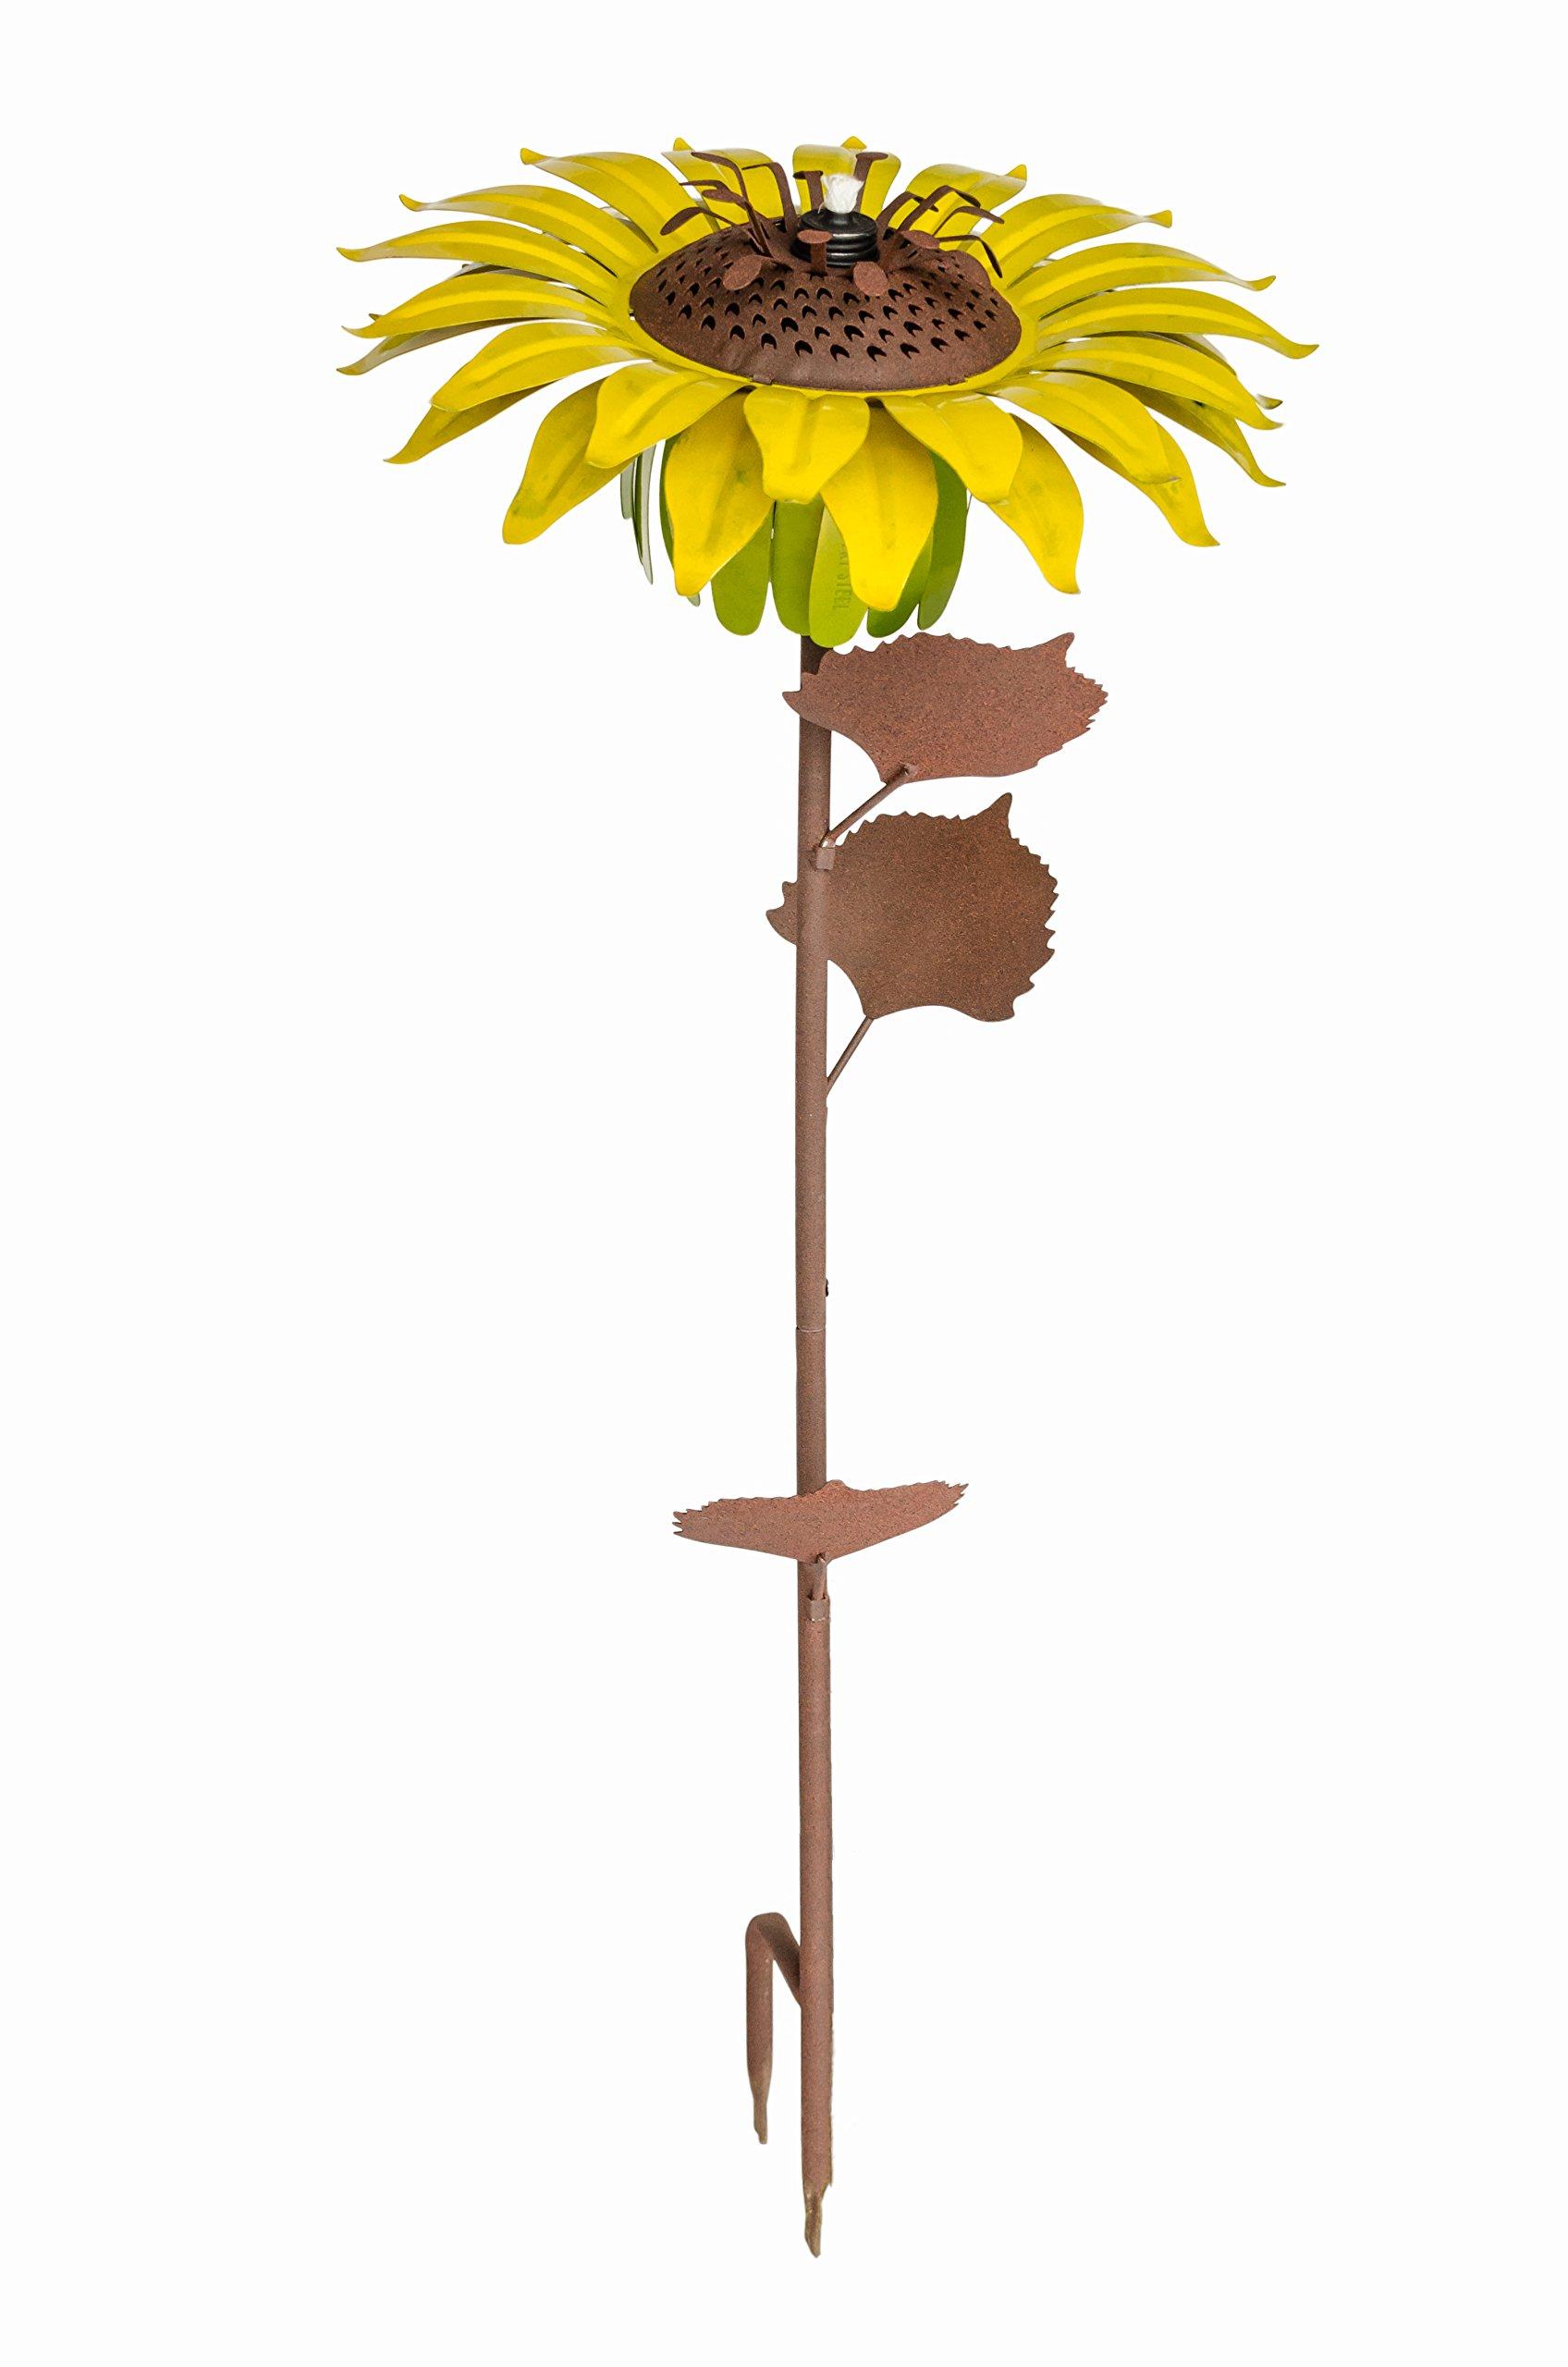 "Desert Steel Flower Torch - (Yellow Sunflower, 32"" H x14"" W) - Metal Art Citronella Garden Torch & Pathway Light w/ Refillable Lamp Oil Canister"